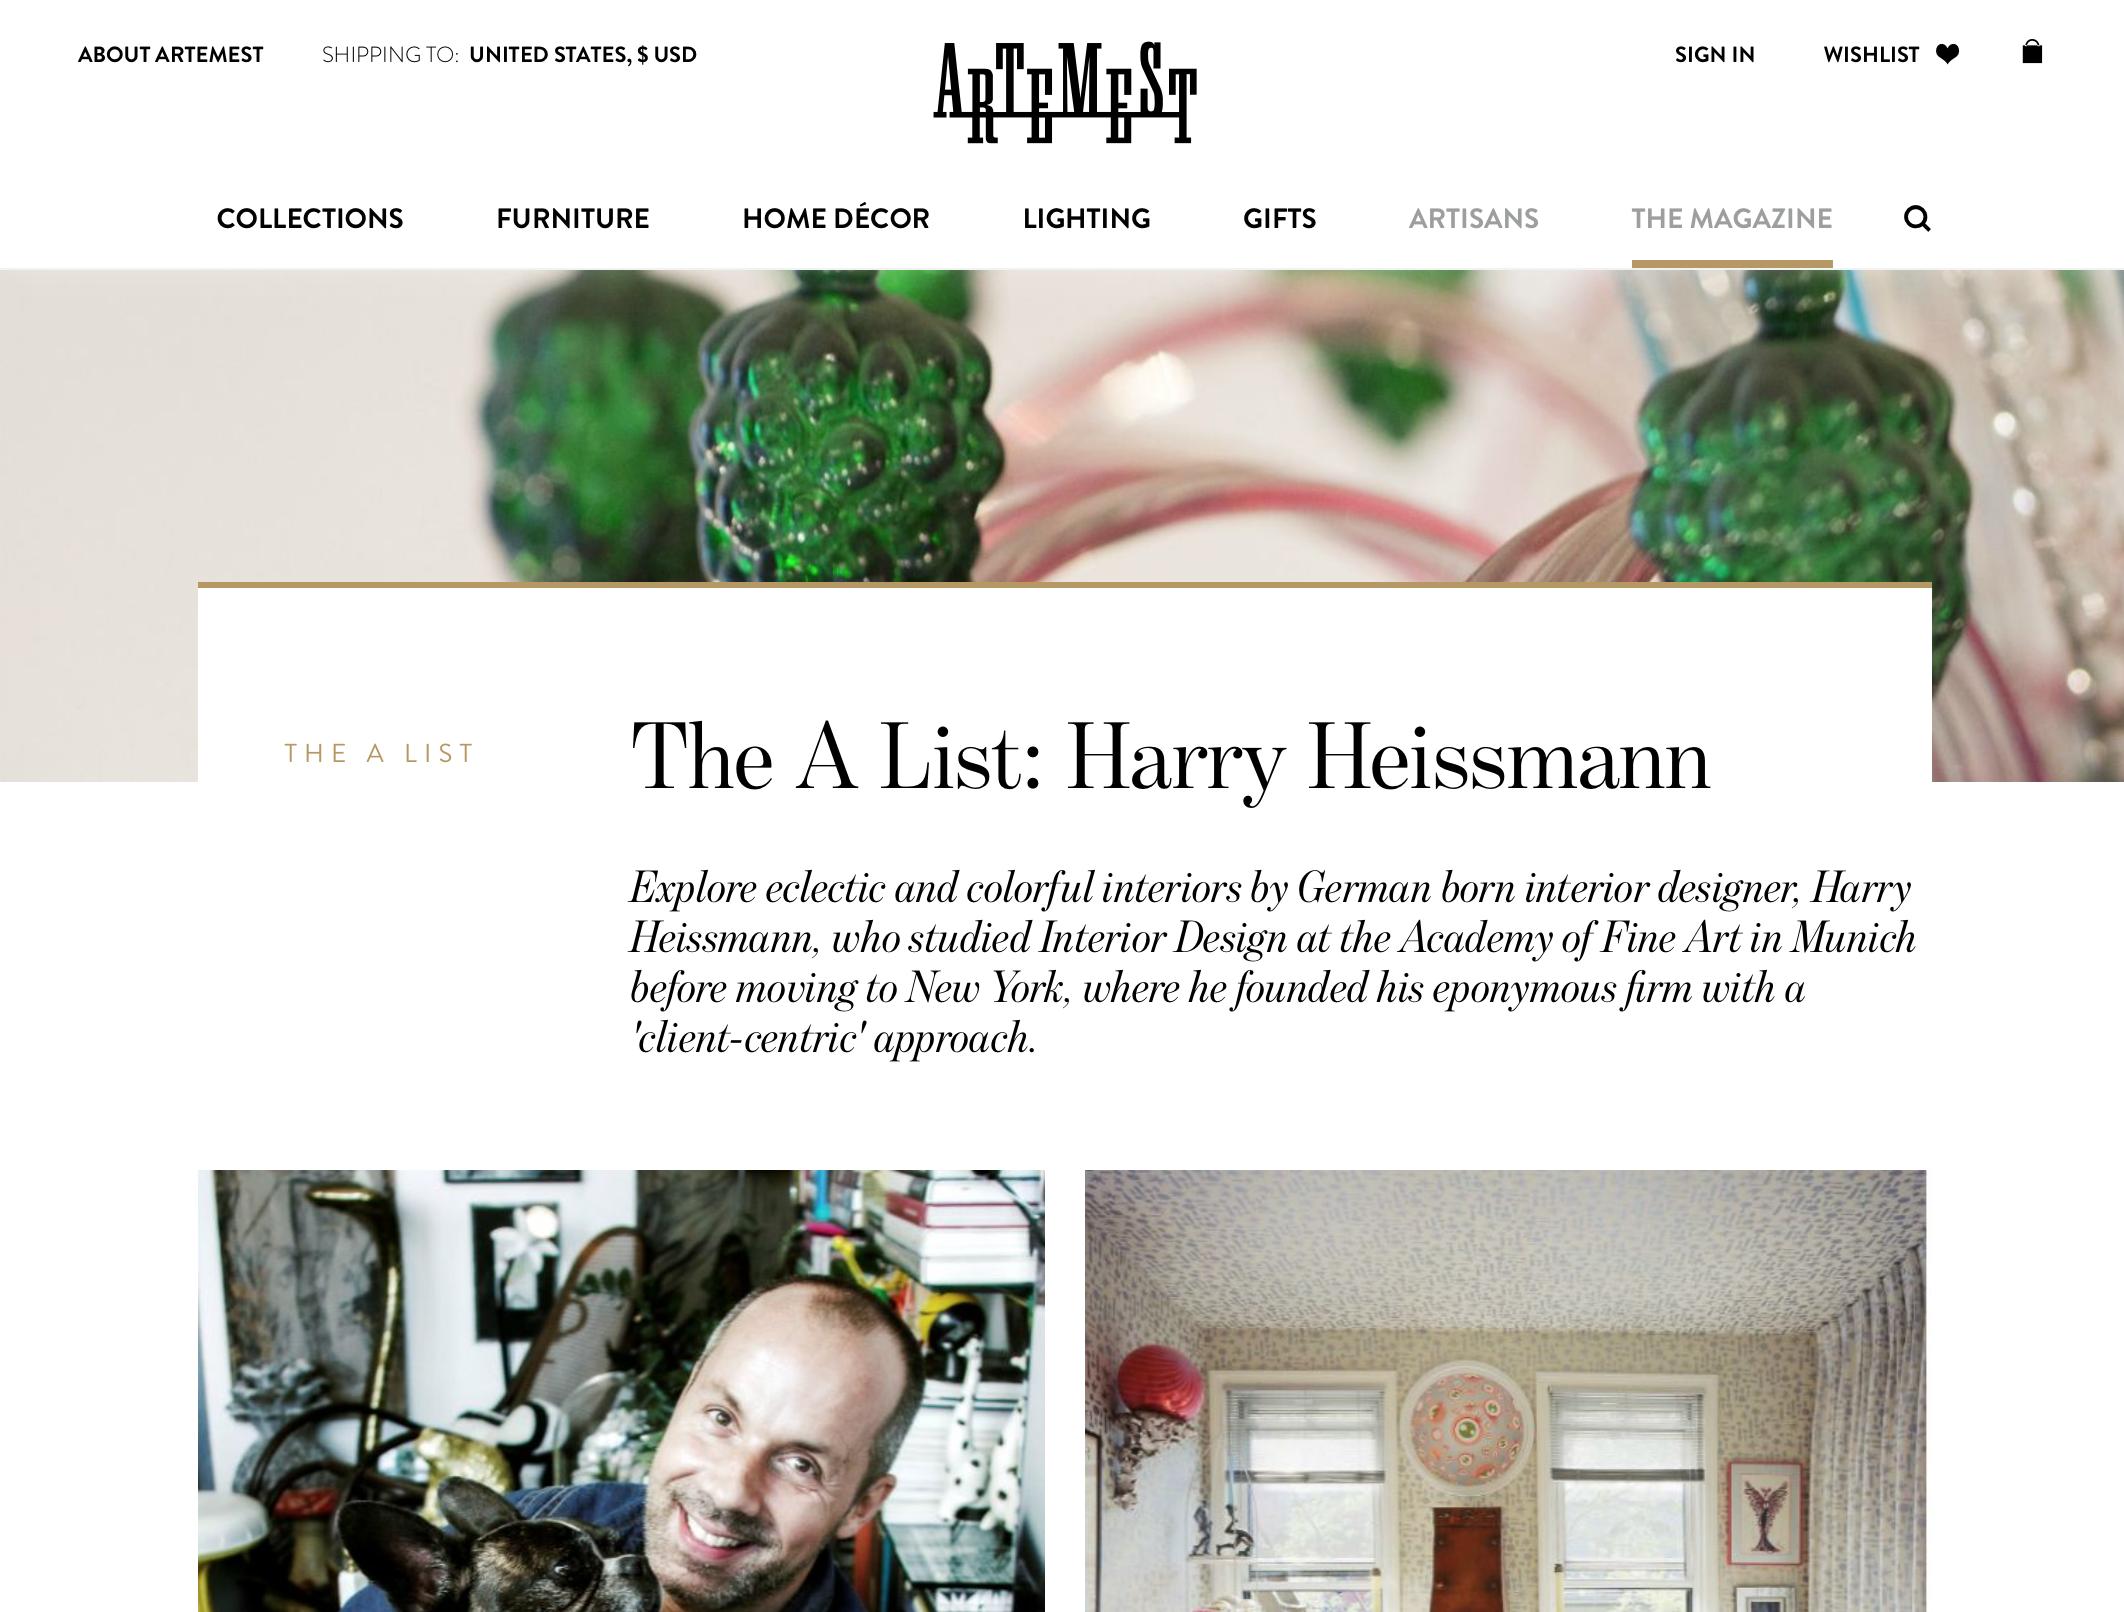 The A List: HH - Artmest highlights Harry on their website.